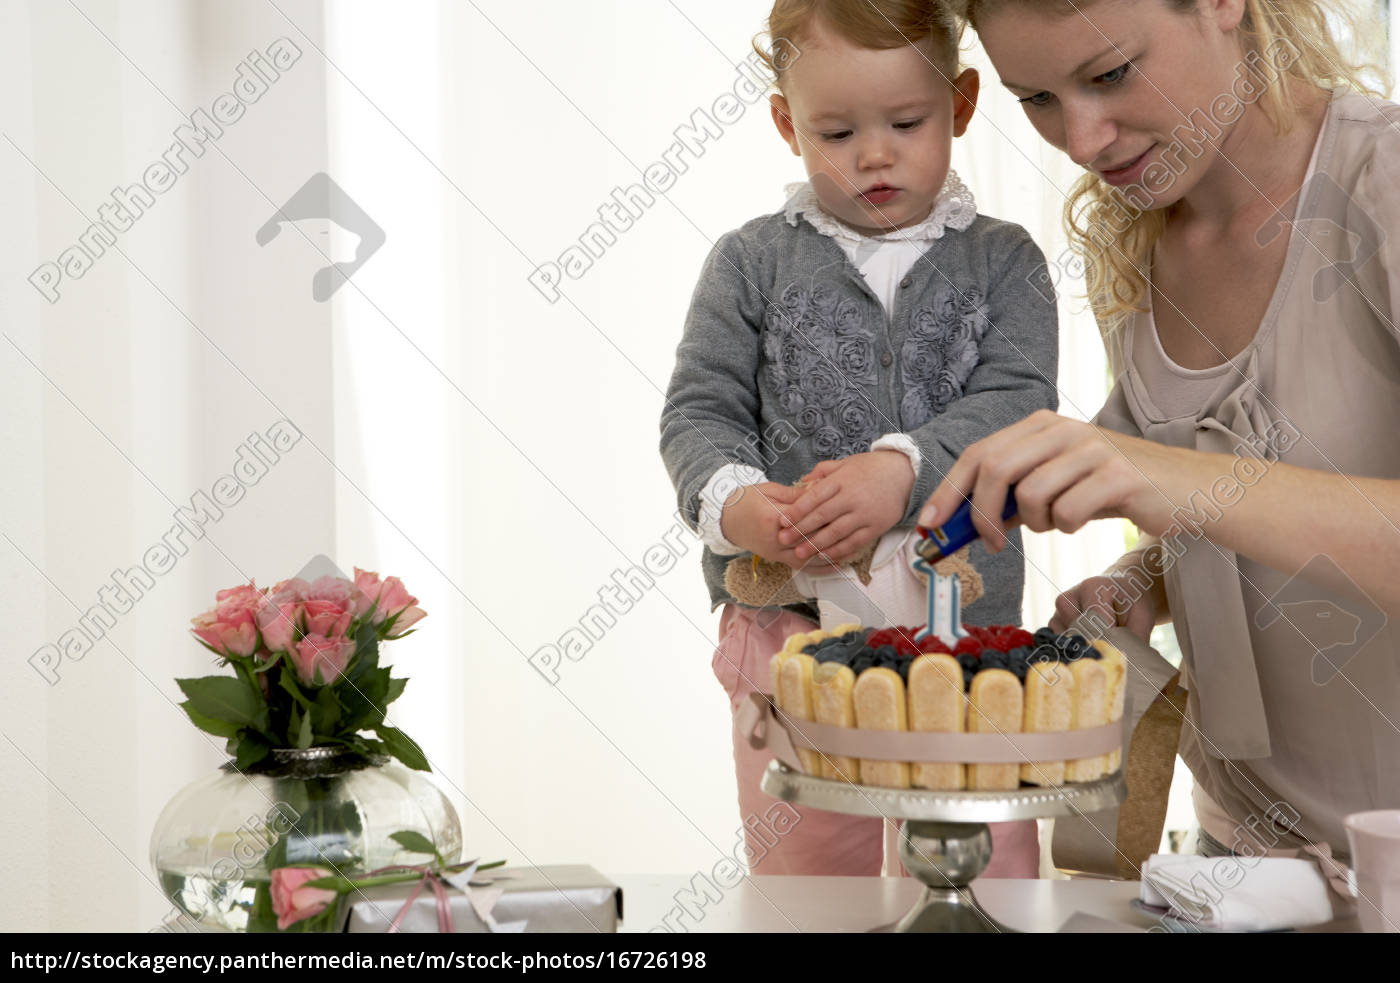 Madre E Hija Celebrando El Primer Cumpleanos De La Stockphoto